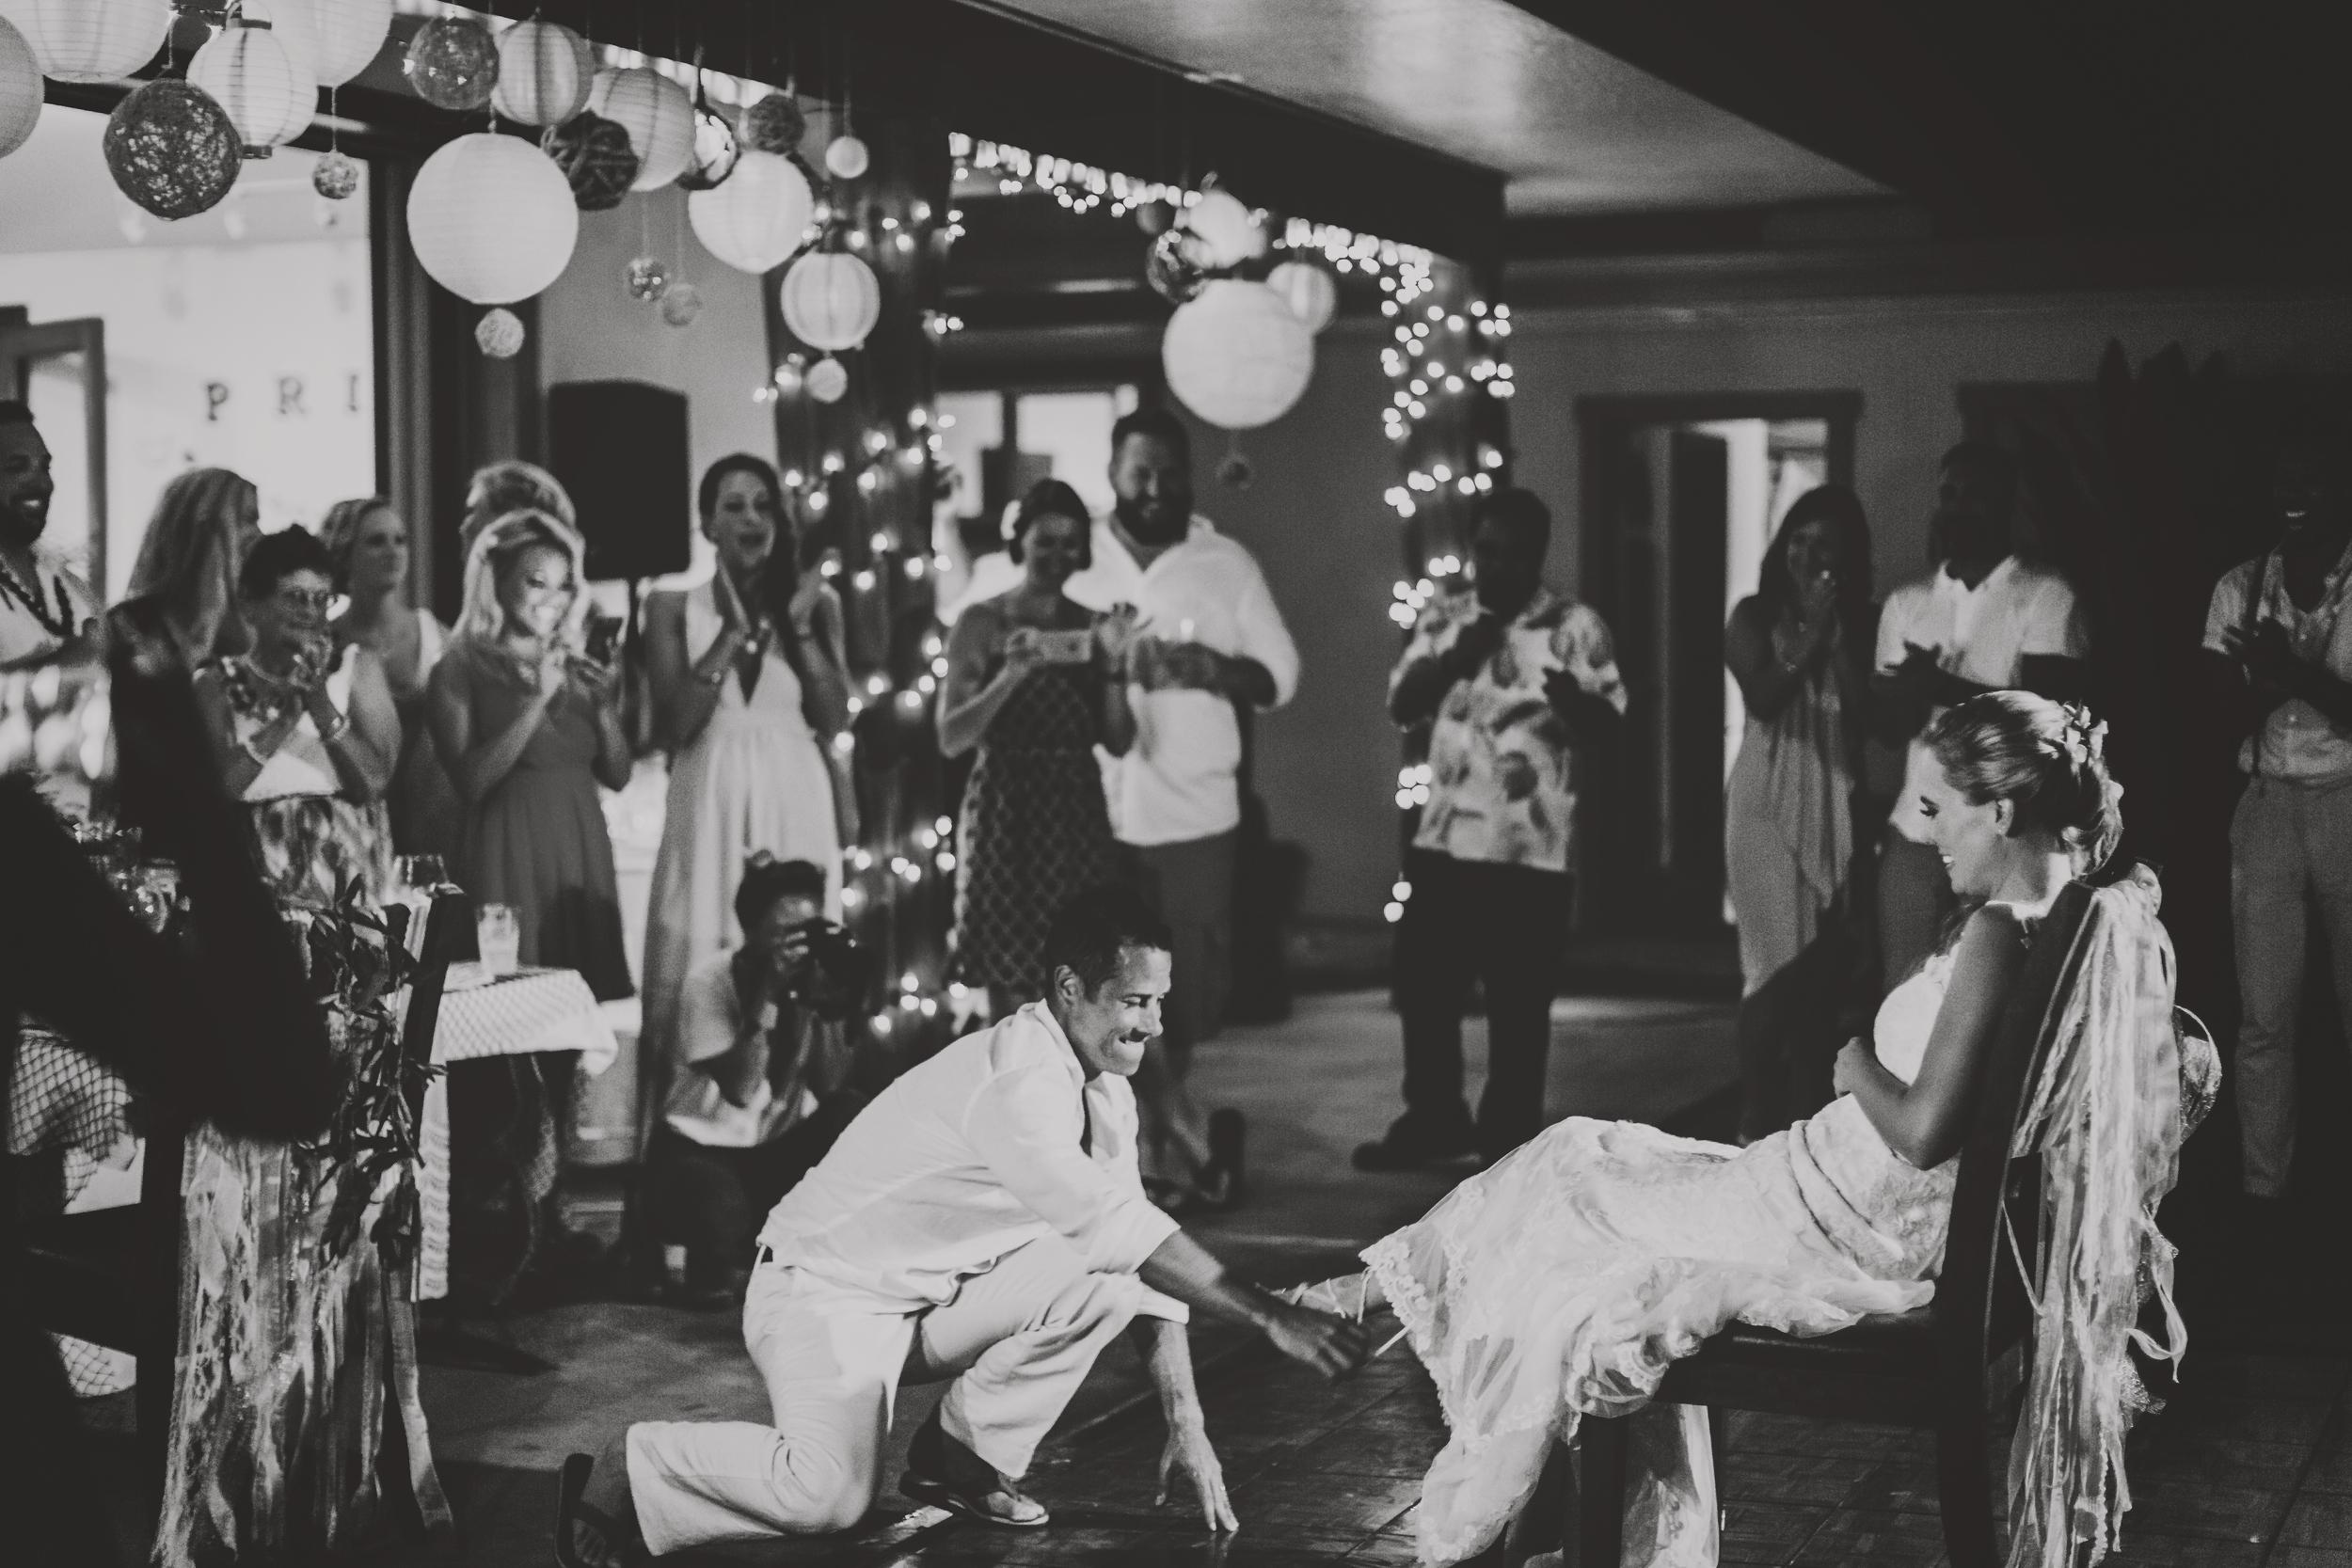 angie-diaz-photography-hawaii-wedding-photographer-kelli-jay-134.jpg